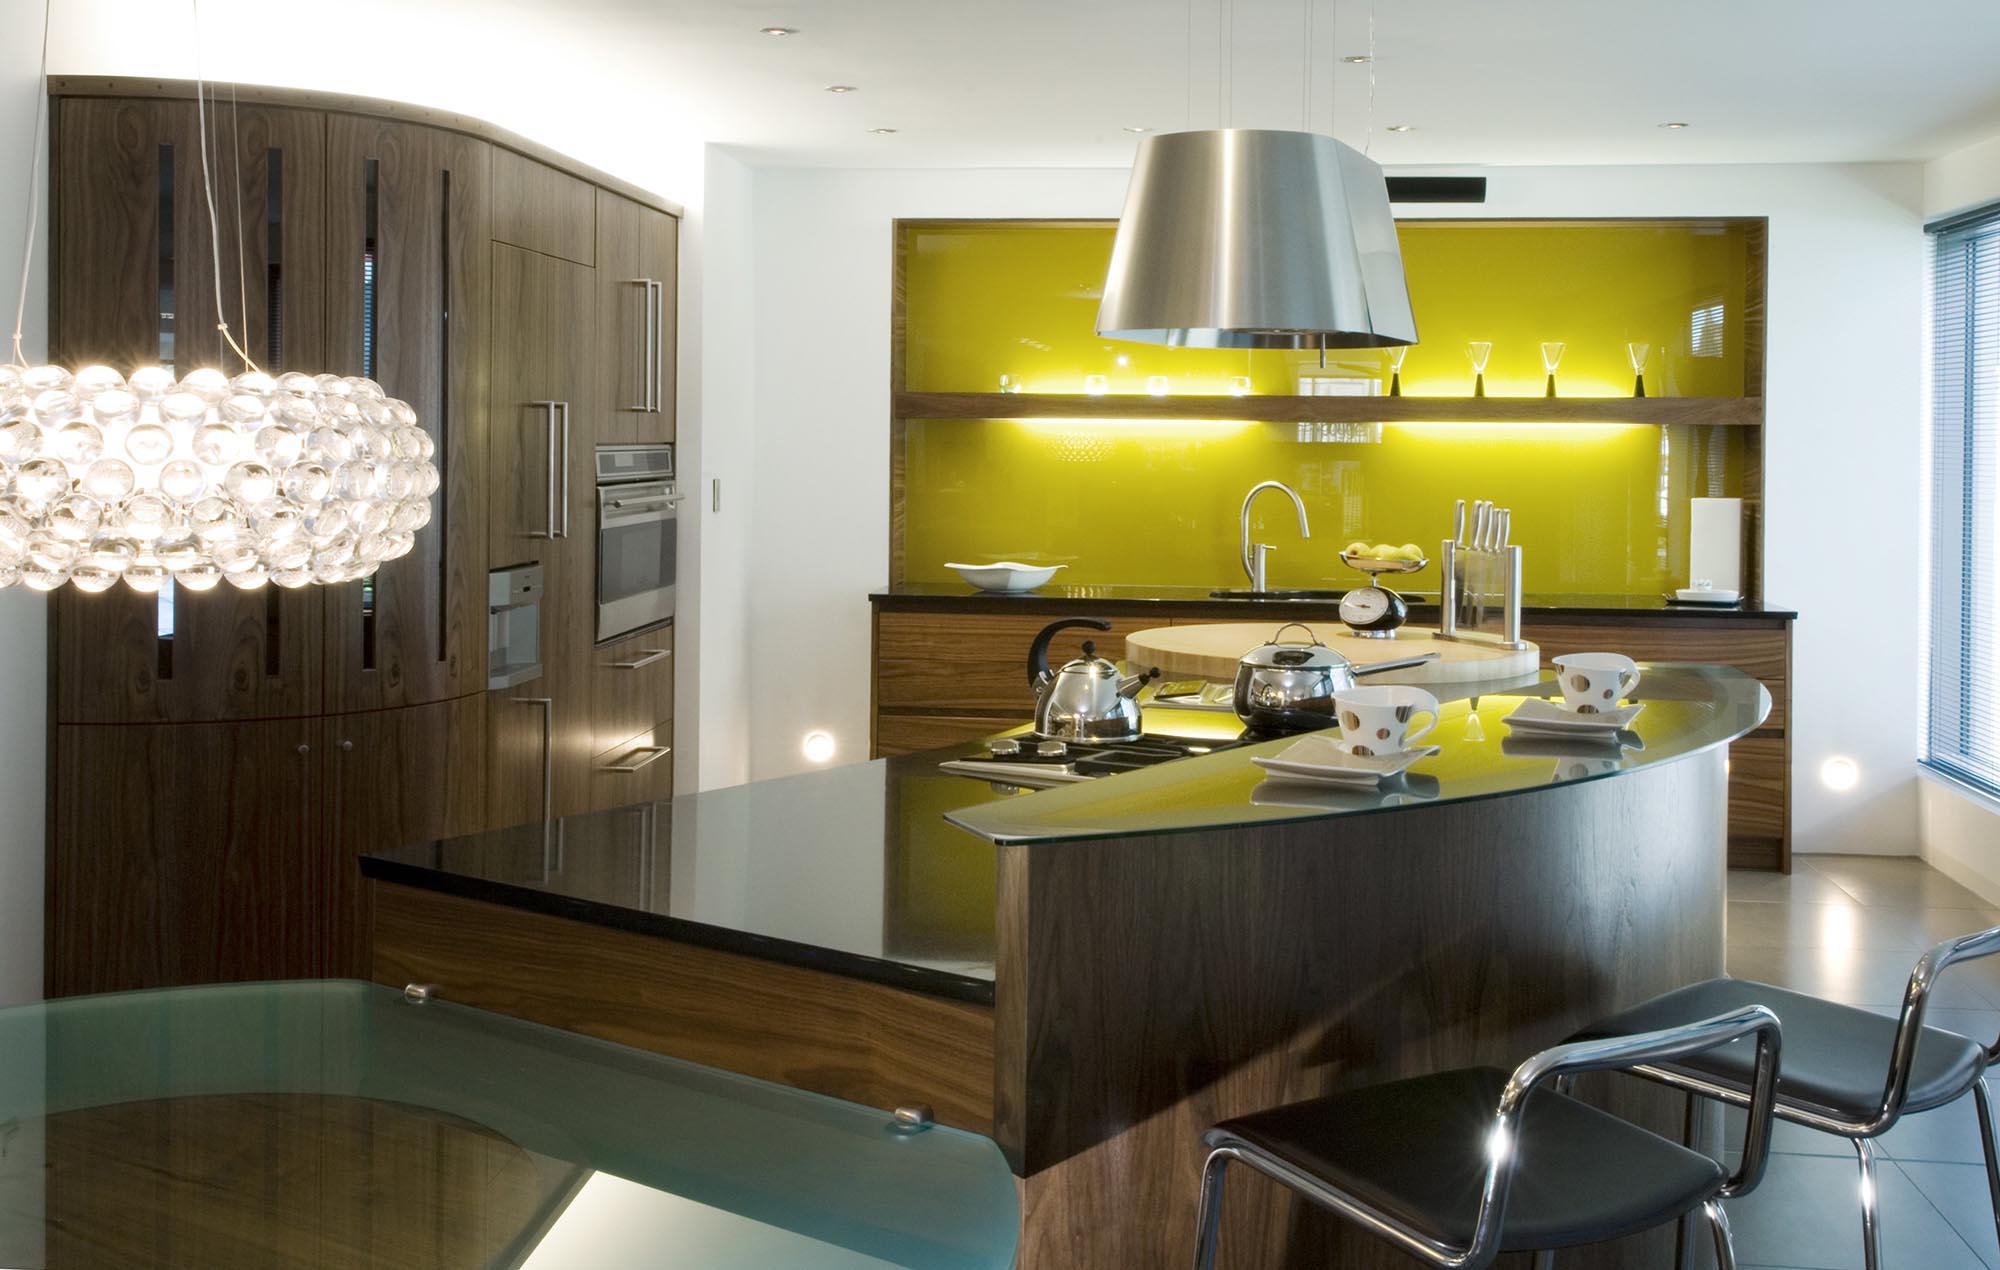 Кухонный стеклянный зеленый фартук